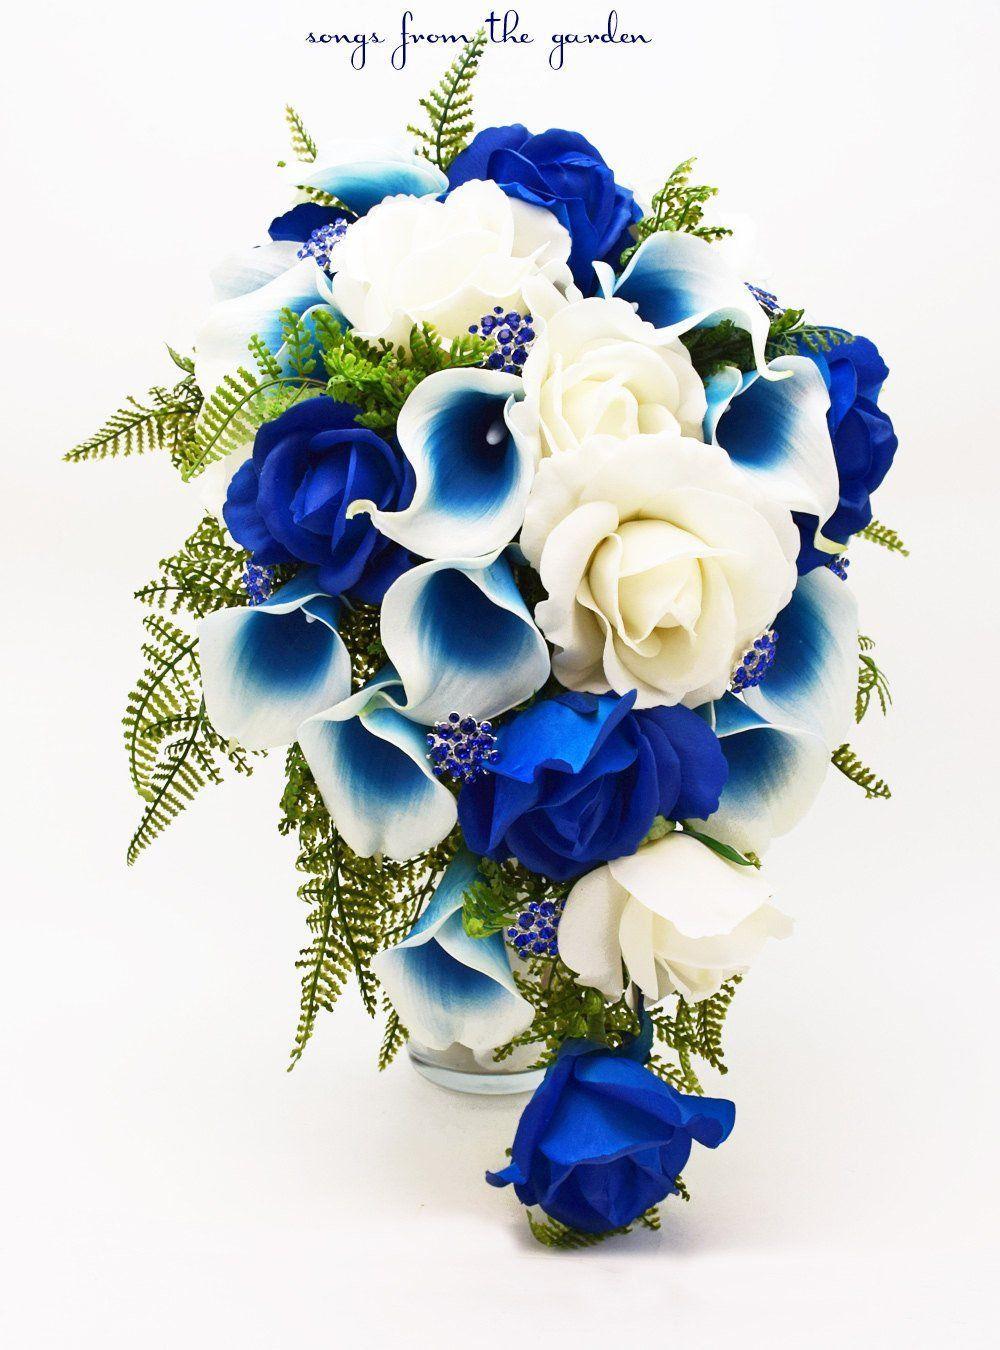 Cascade bridal bouquet blue picasso callas white royal blue roses cascade bridal bouquet blue picasso callas white royal blue roses blue rhinestones accents izmirmasajfo